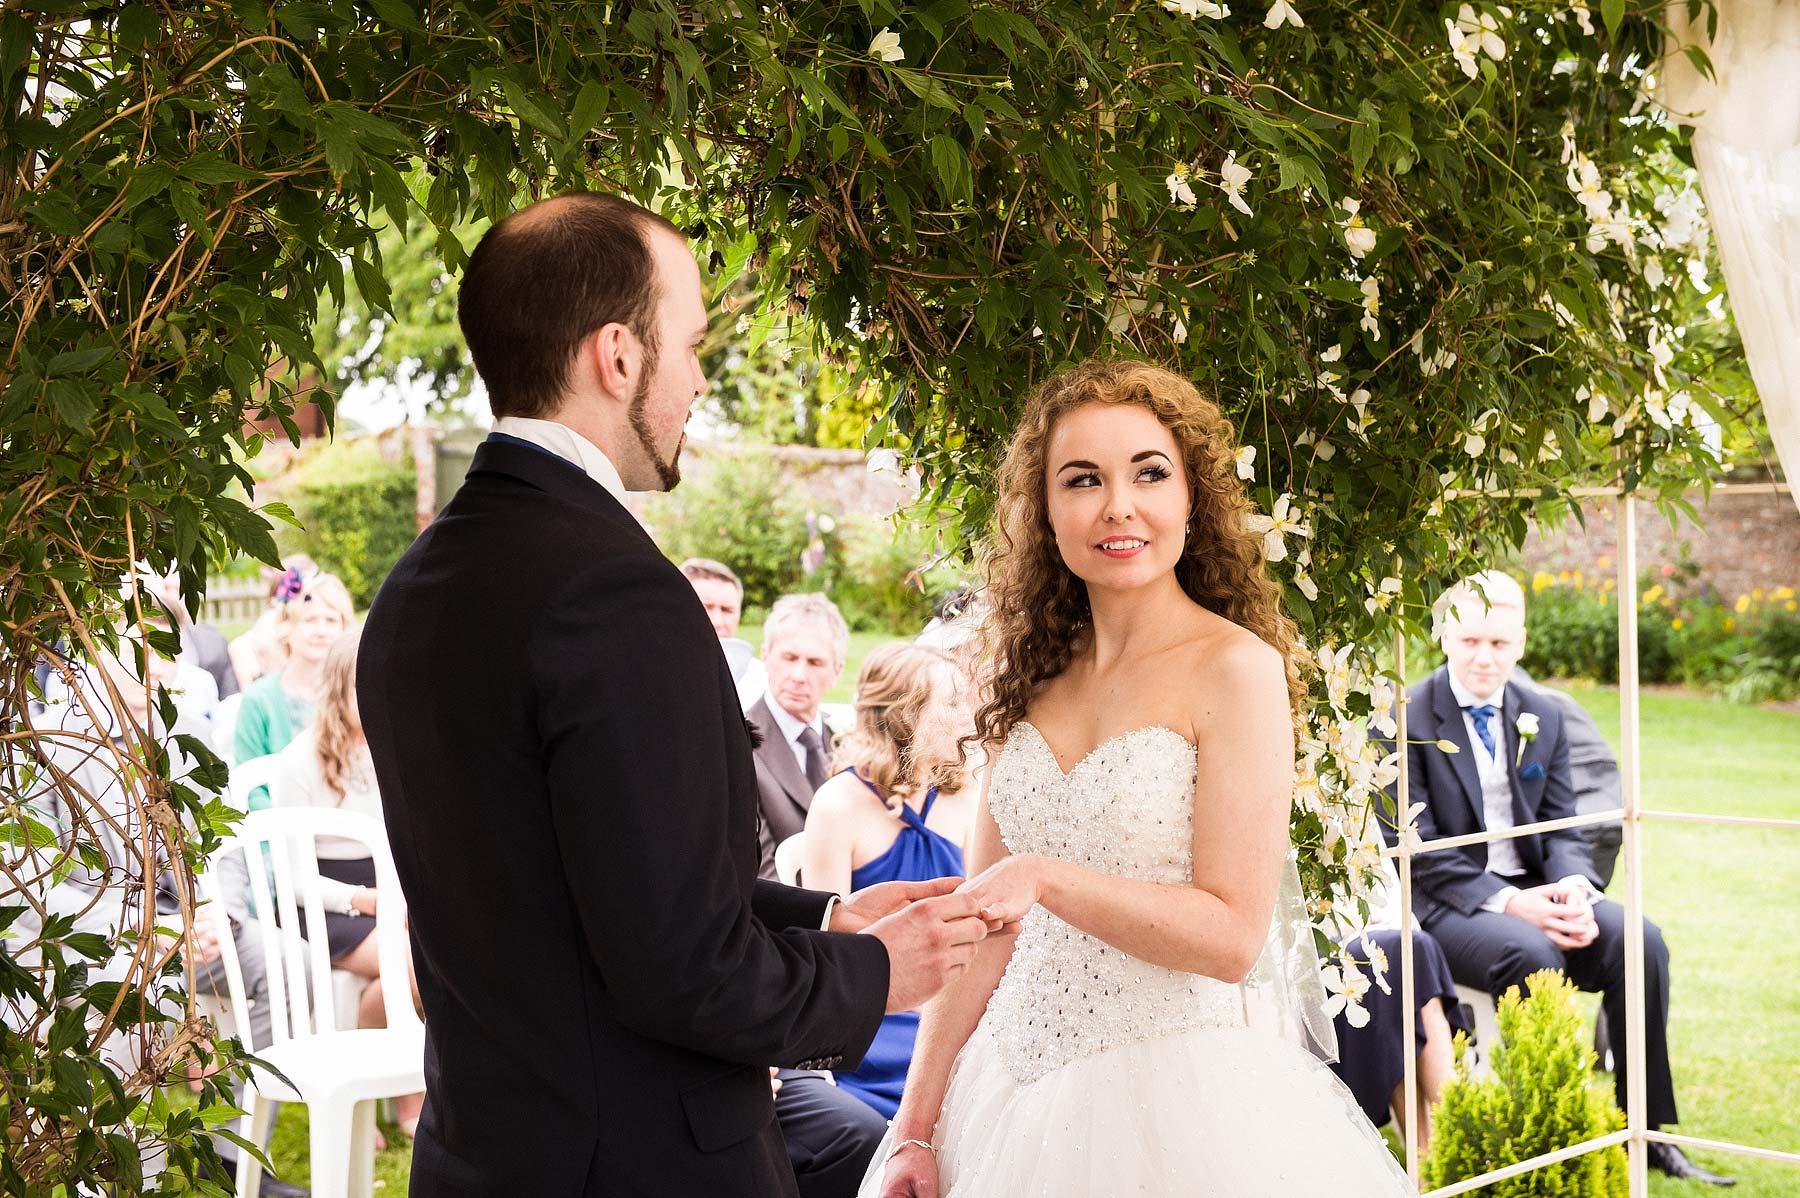 albright-hussey-manor-wedding-photographers-028